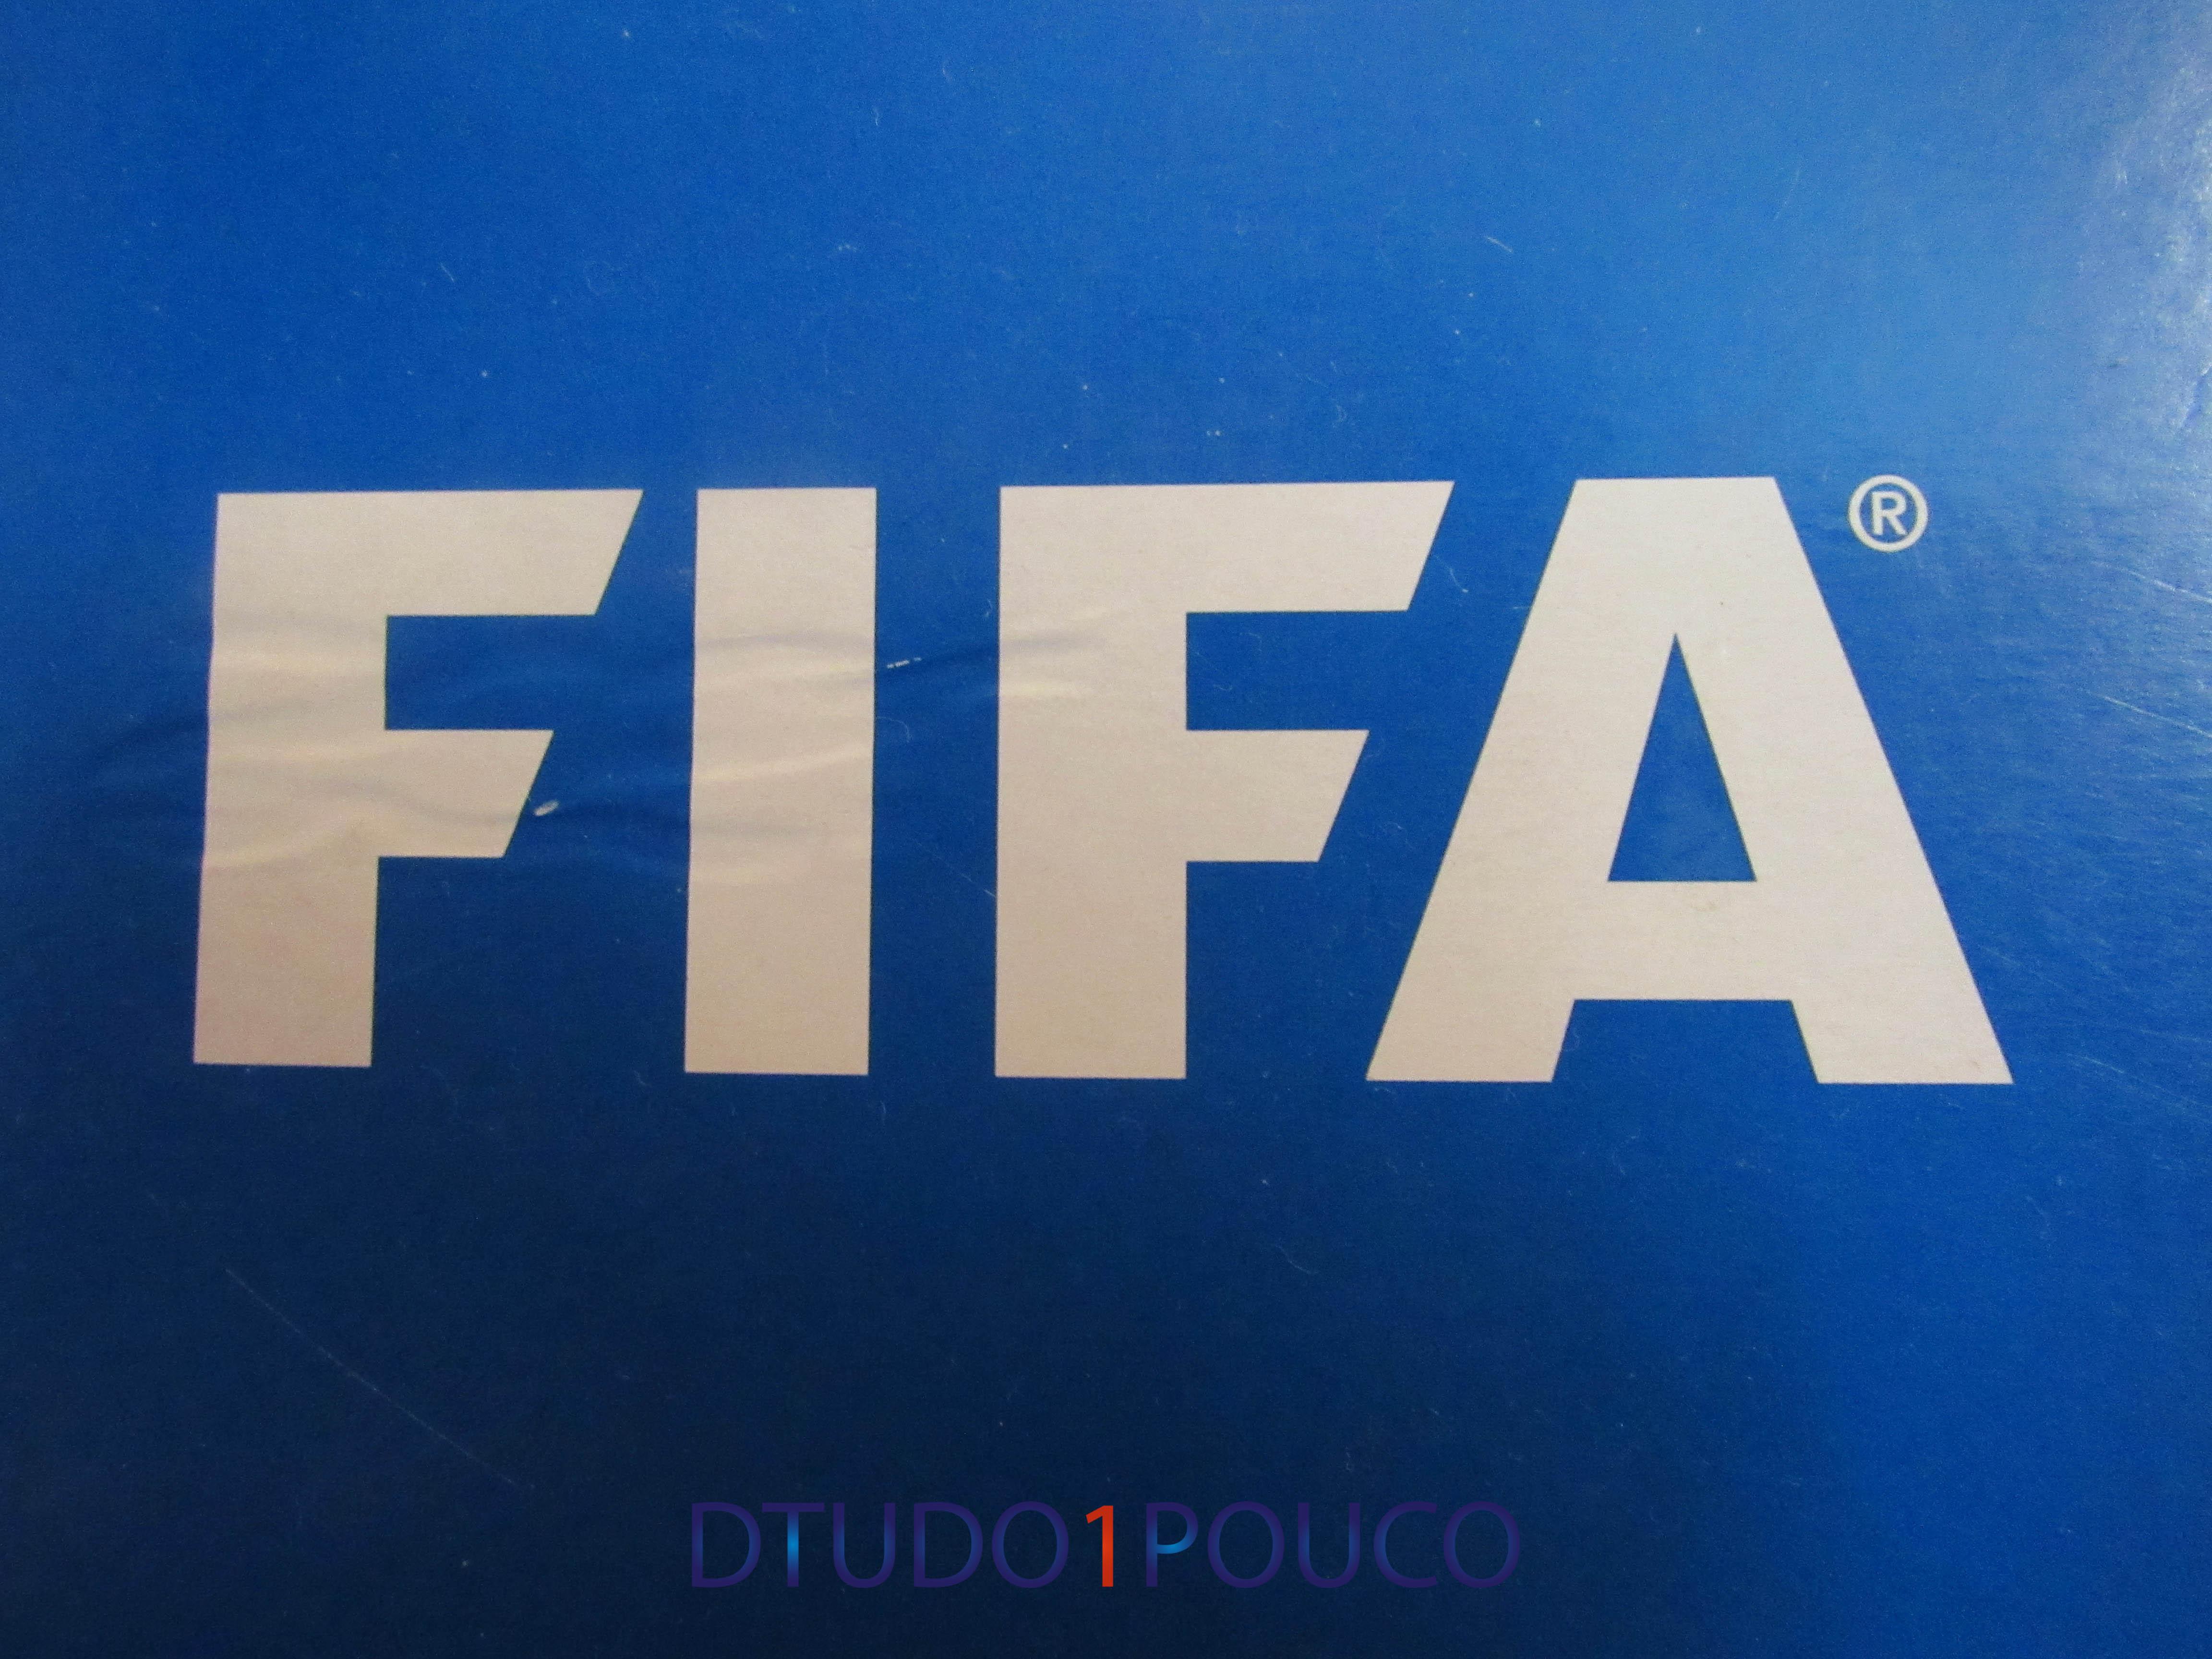 futebolmundial Instagram posts